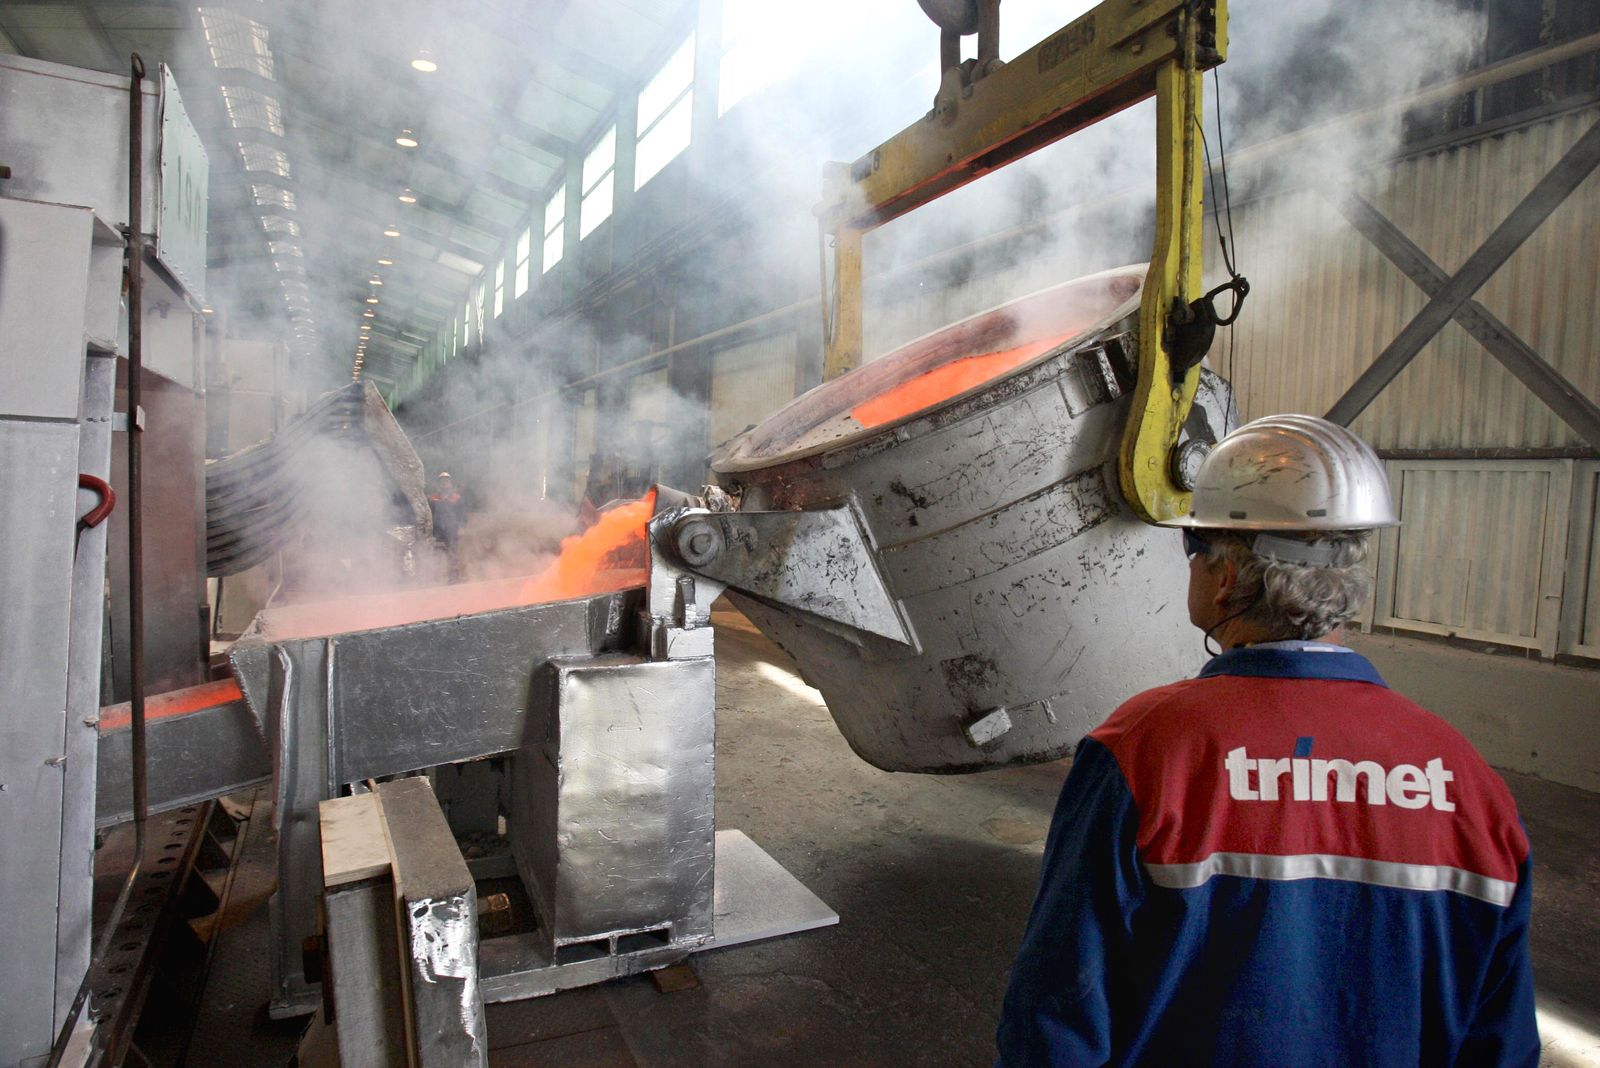 Trimet AG / Aluhütte / Produktion